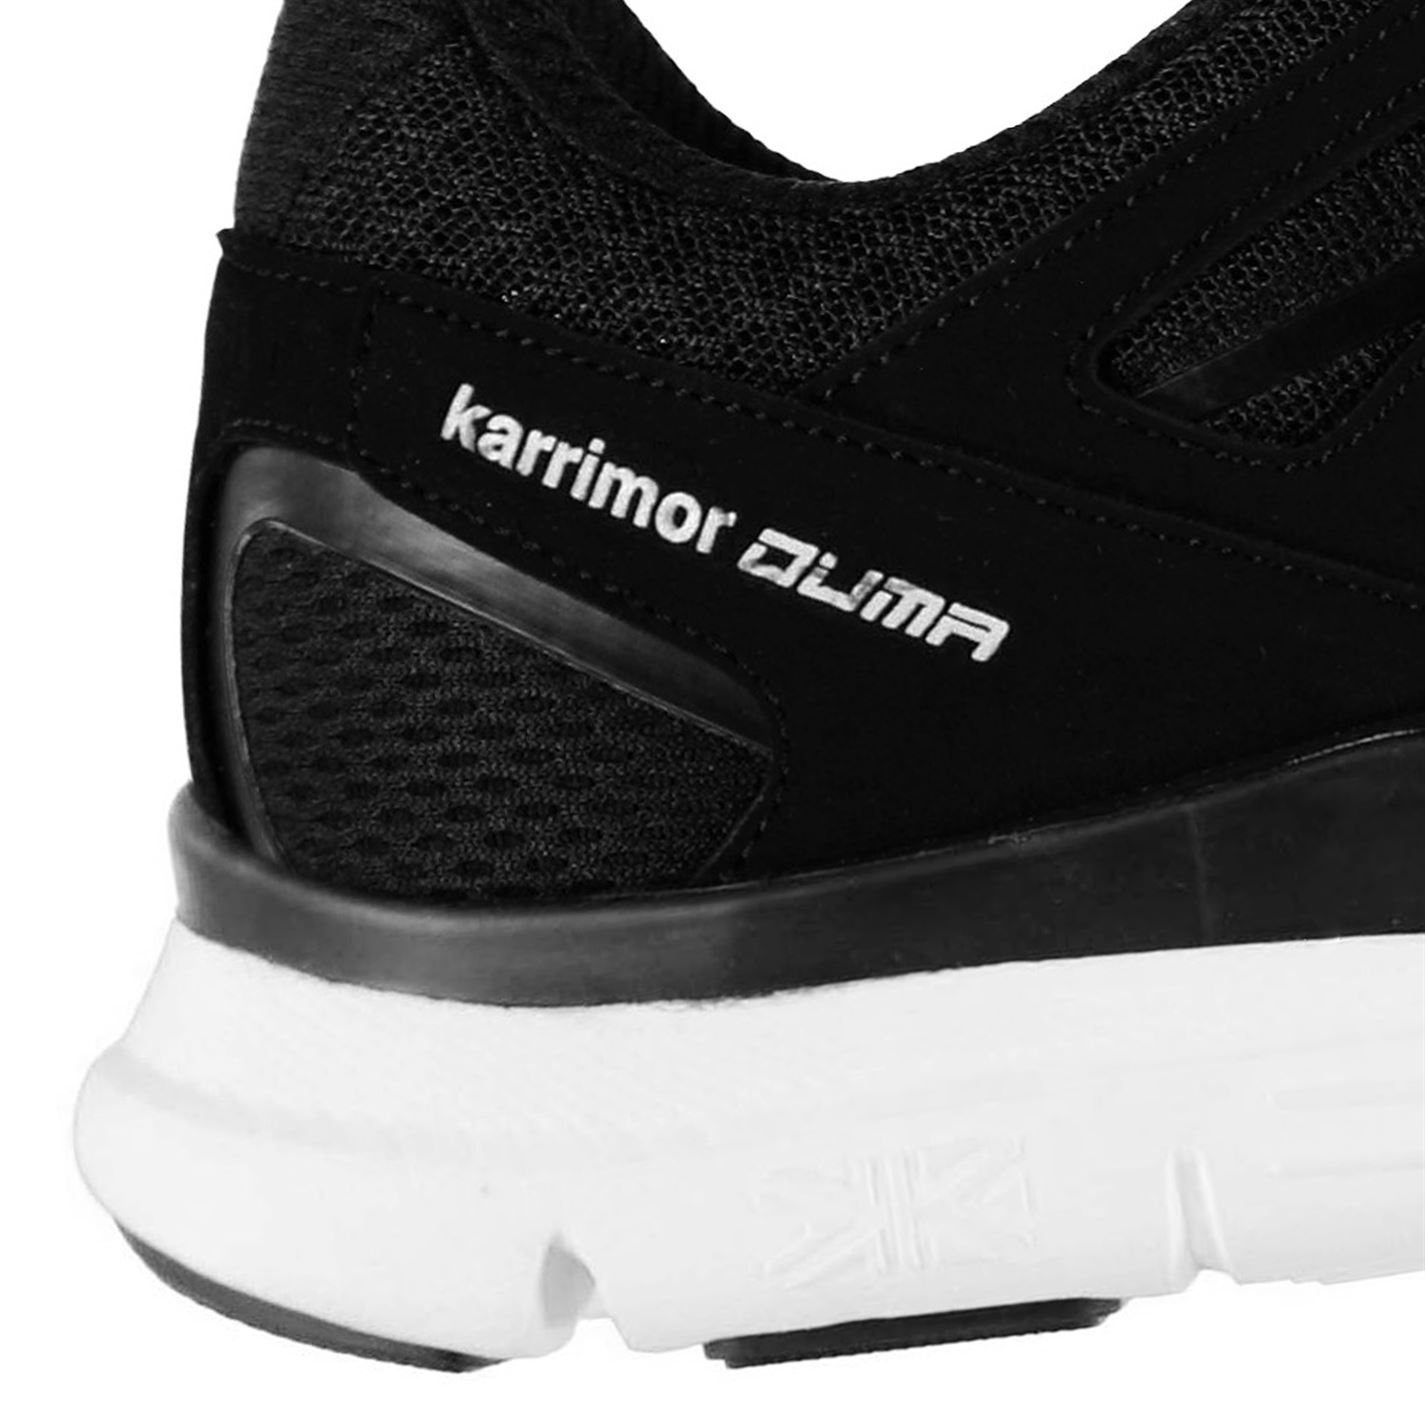 Karrimor-Mens-Duma-Trainers-Lace-Up-Sports-Running-Cross-Training-Shoes thumbnail 20